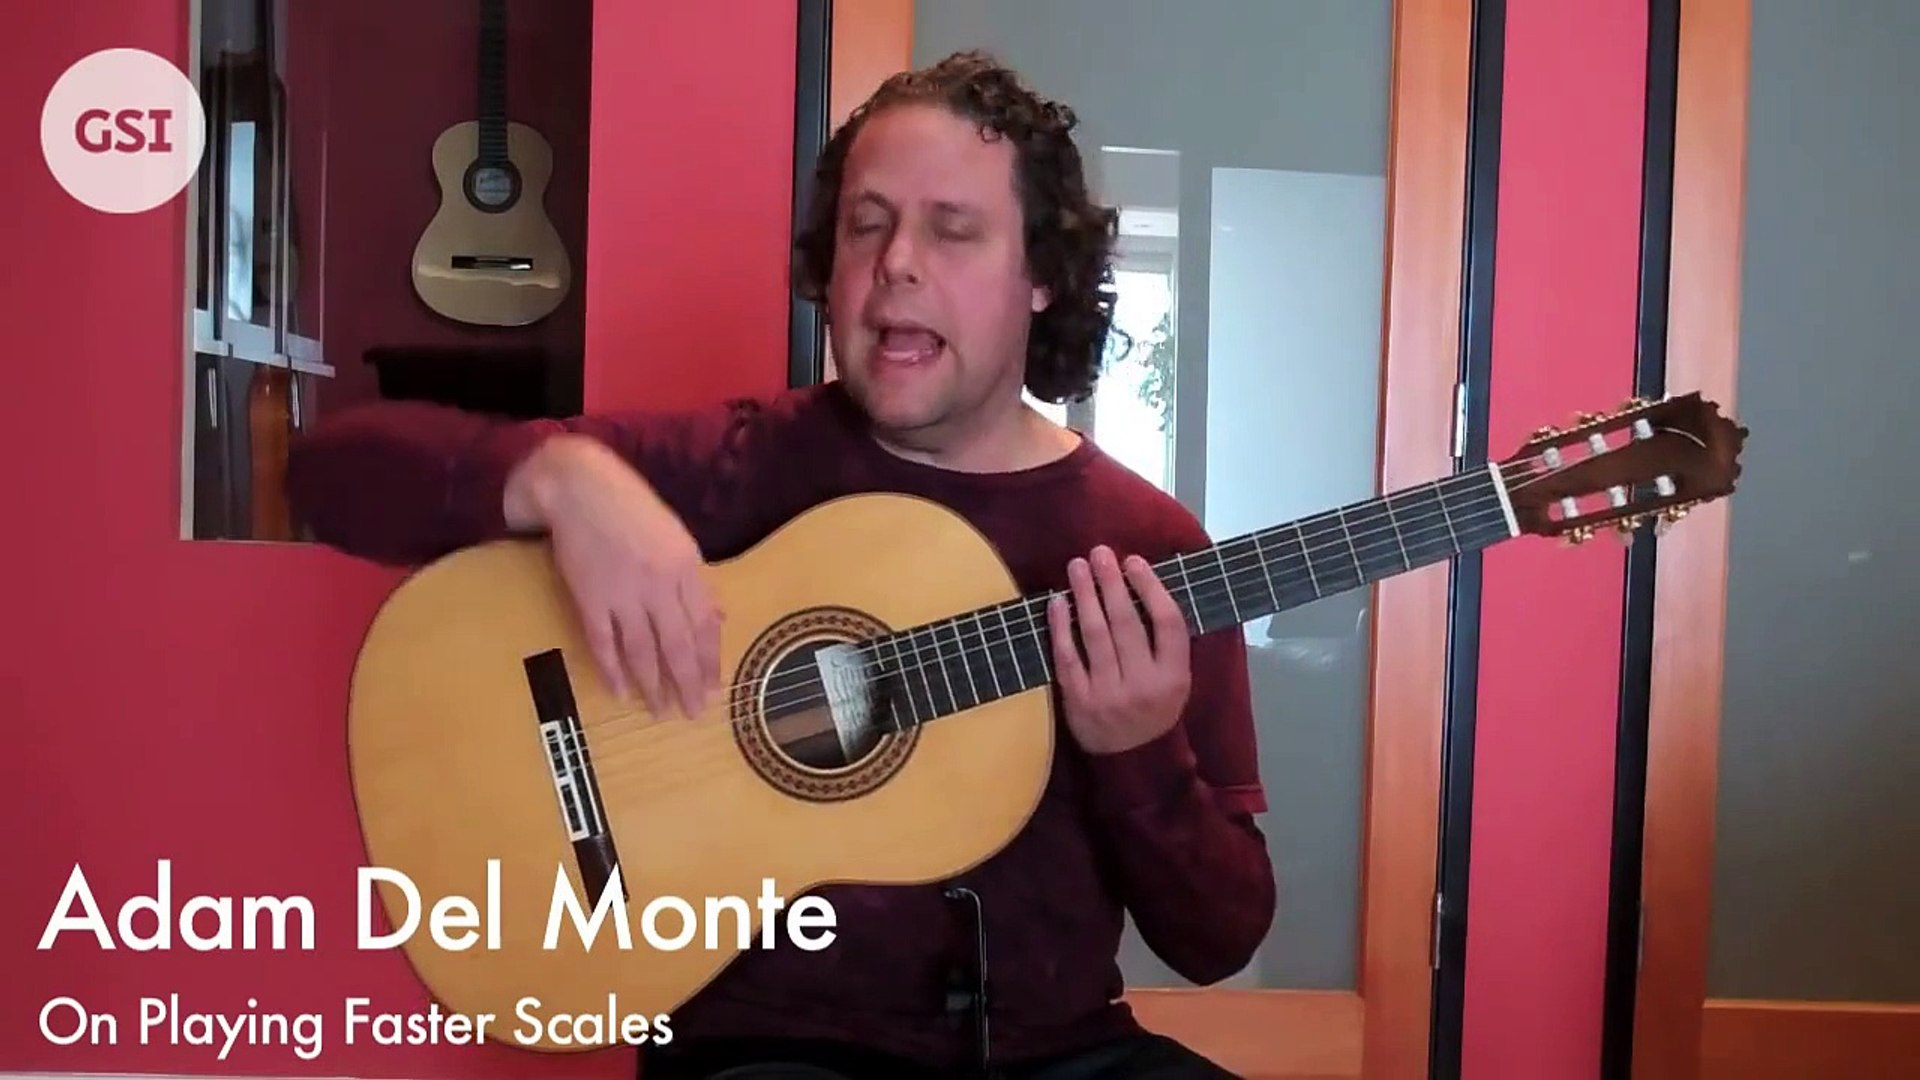 Adam Del Monte - How to Play Faster Scales: Flamenco Guitar at Guitar Salon International